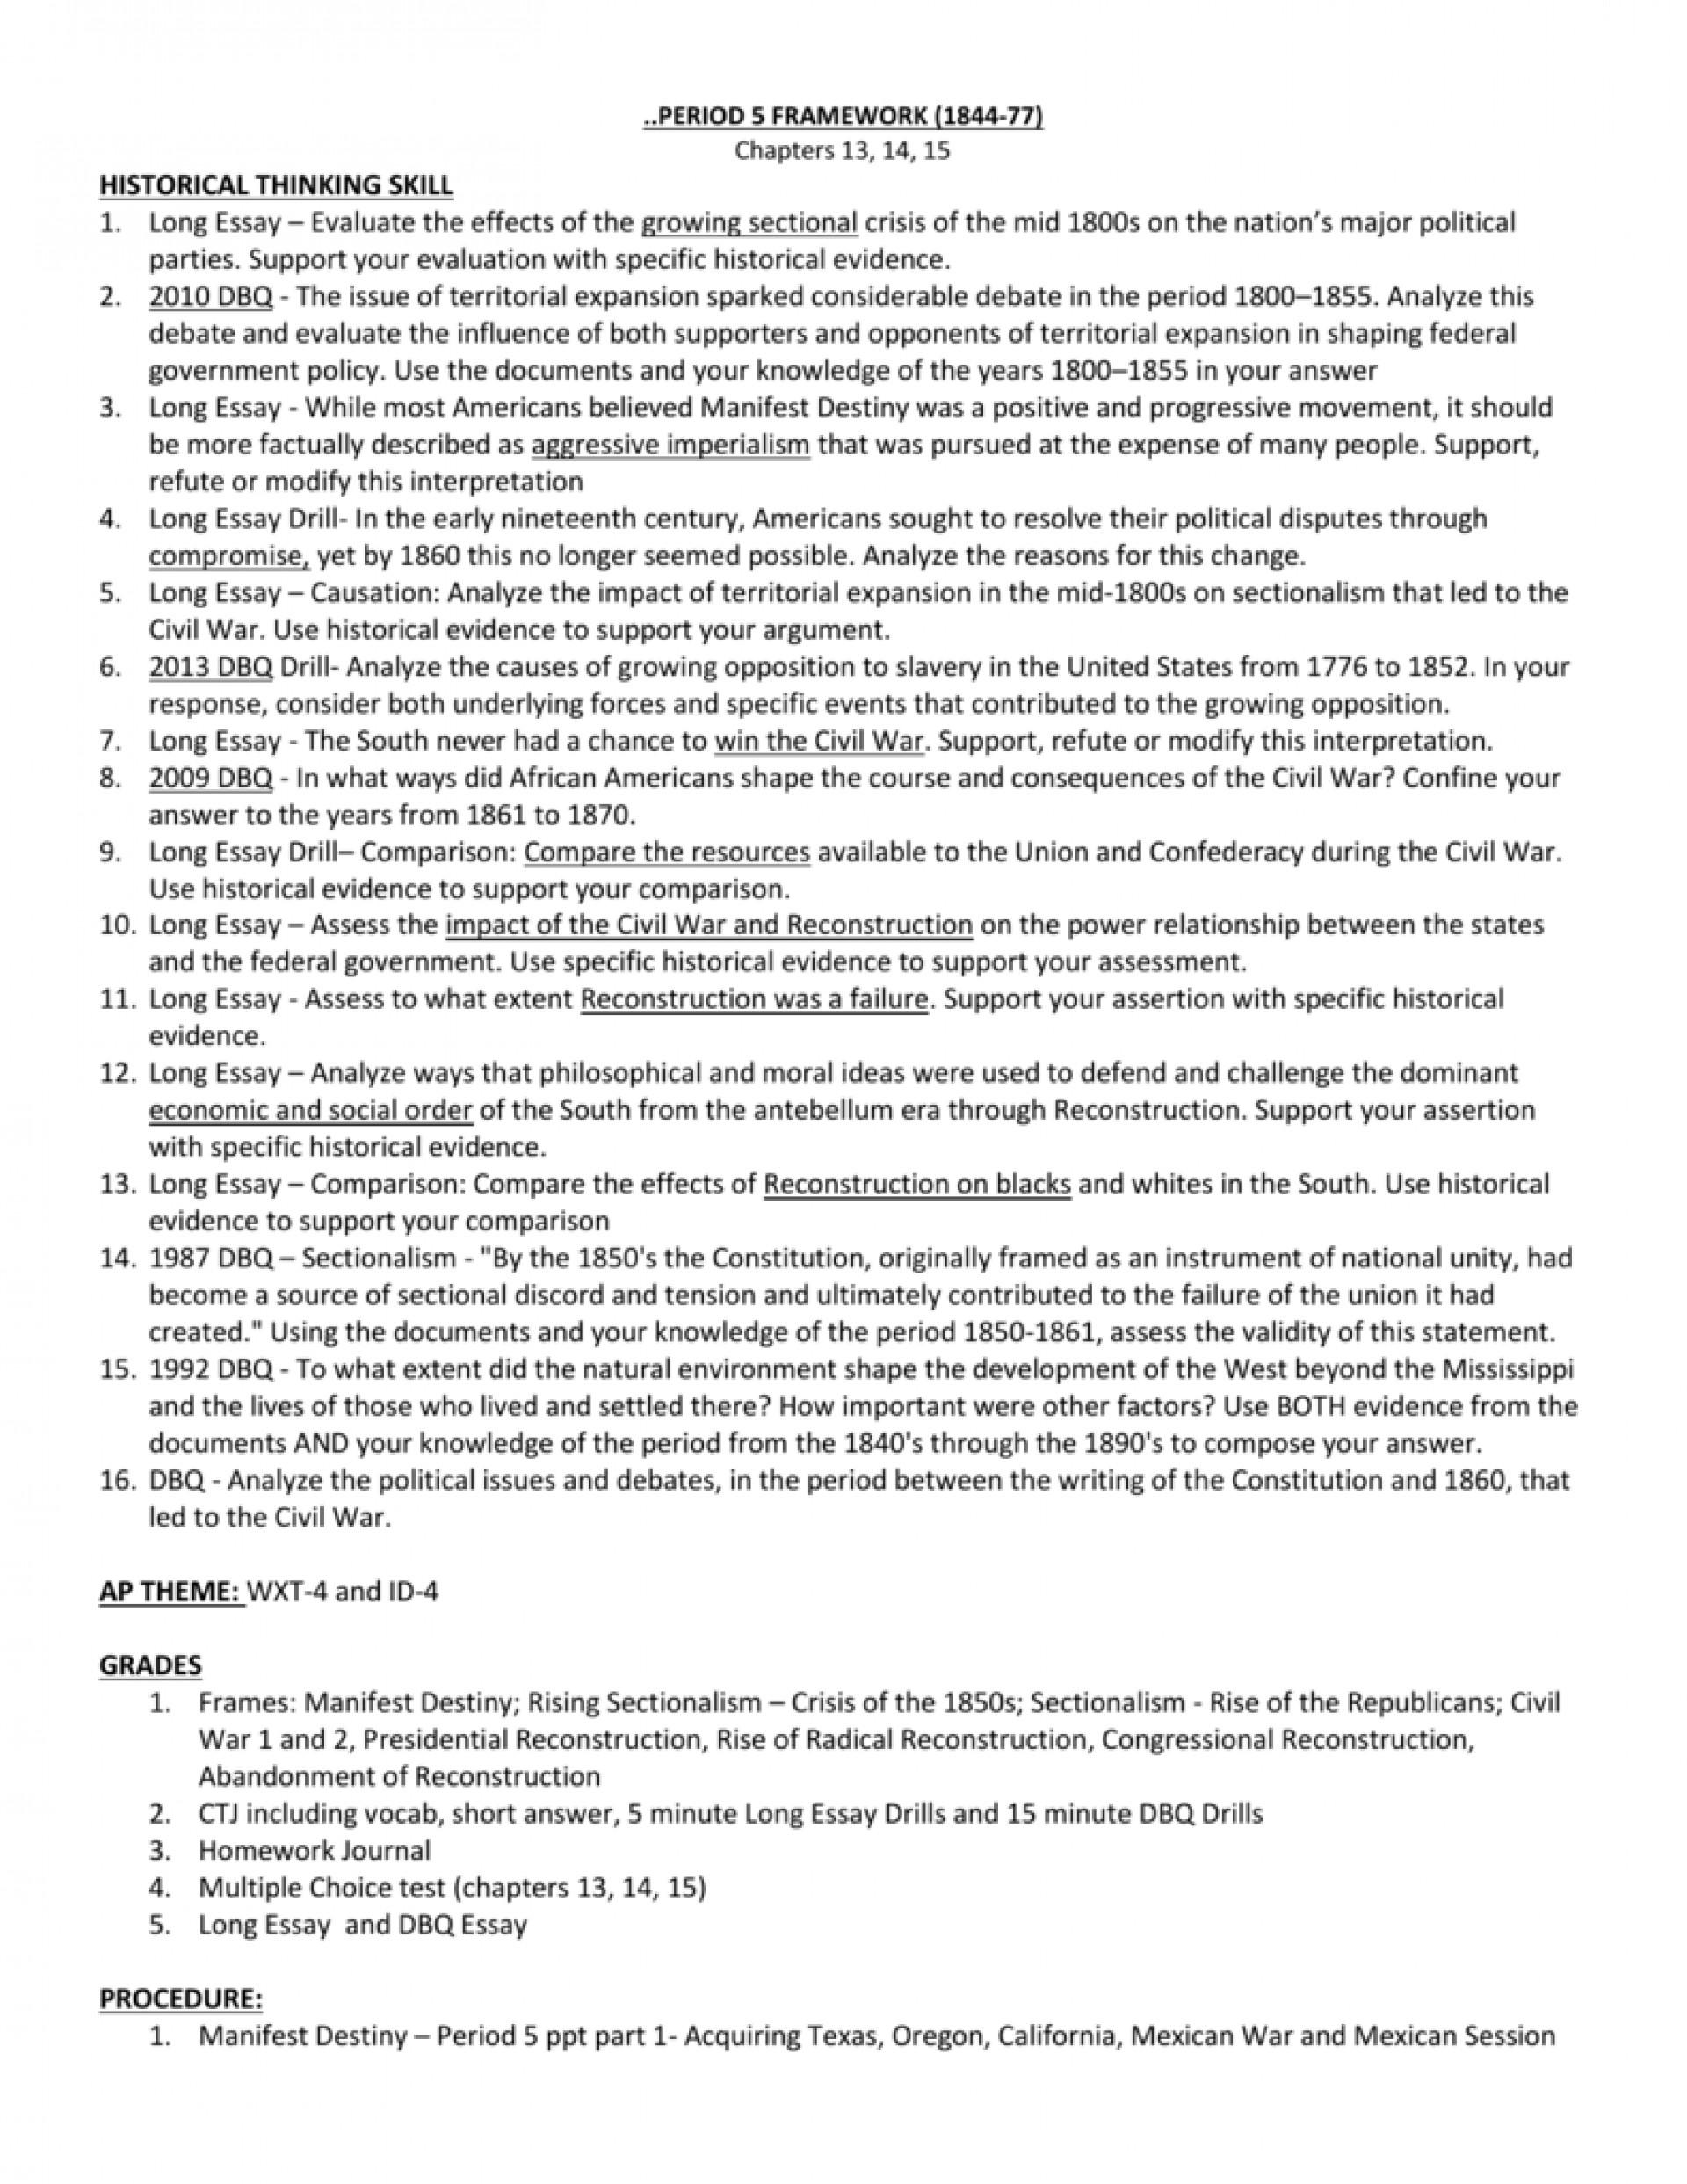 006 Manifest Destiny Essay 007190351 1 Impressive Prompt Outline Introduction 1920